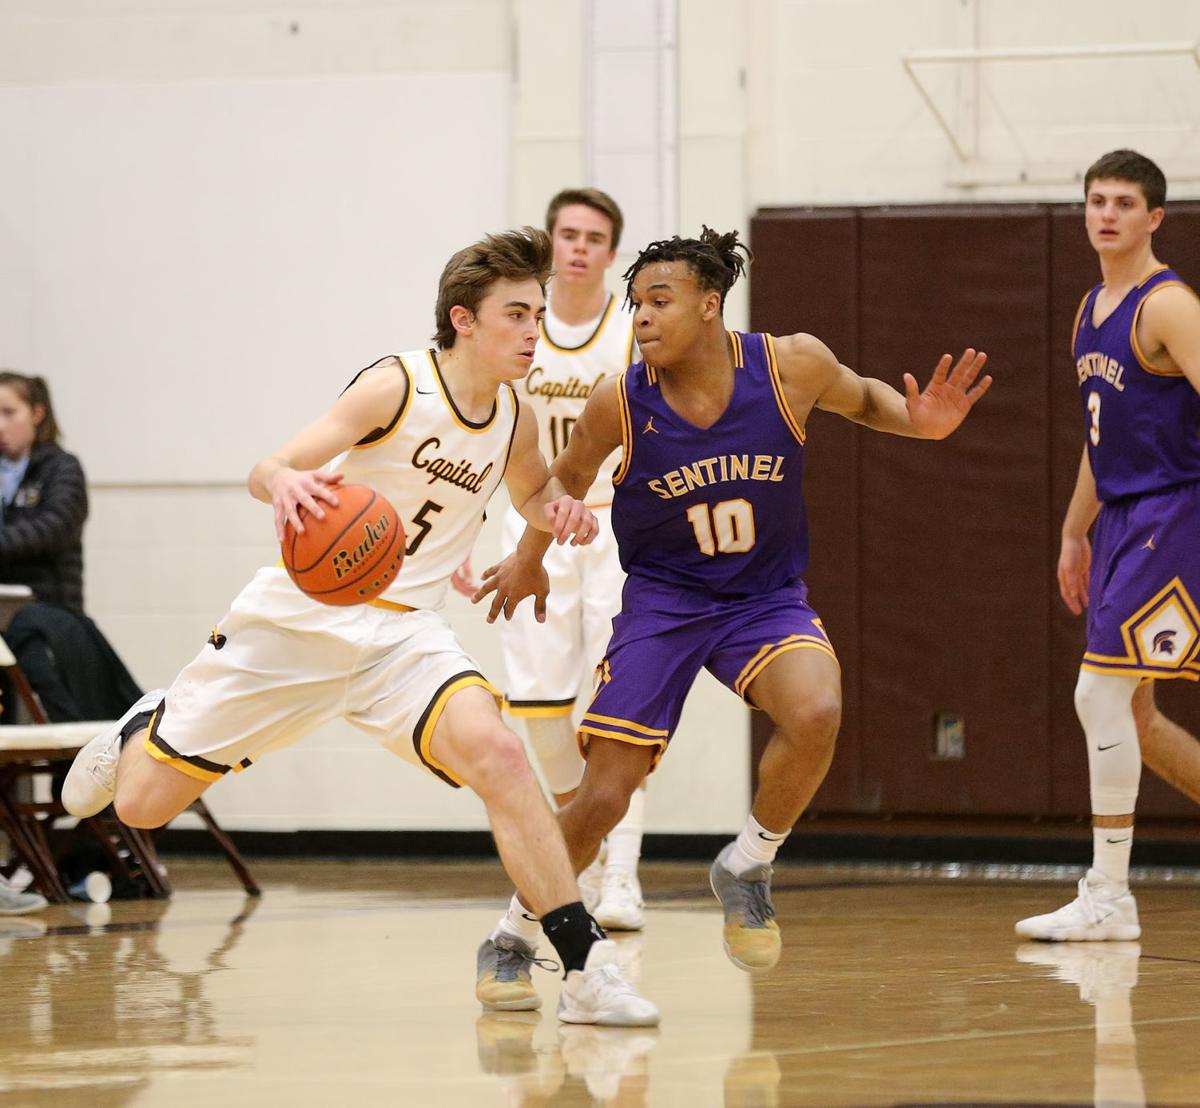 bvoys basketball; CHS vs Sentinel